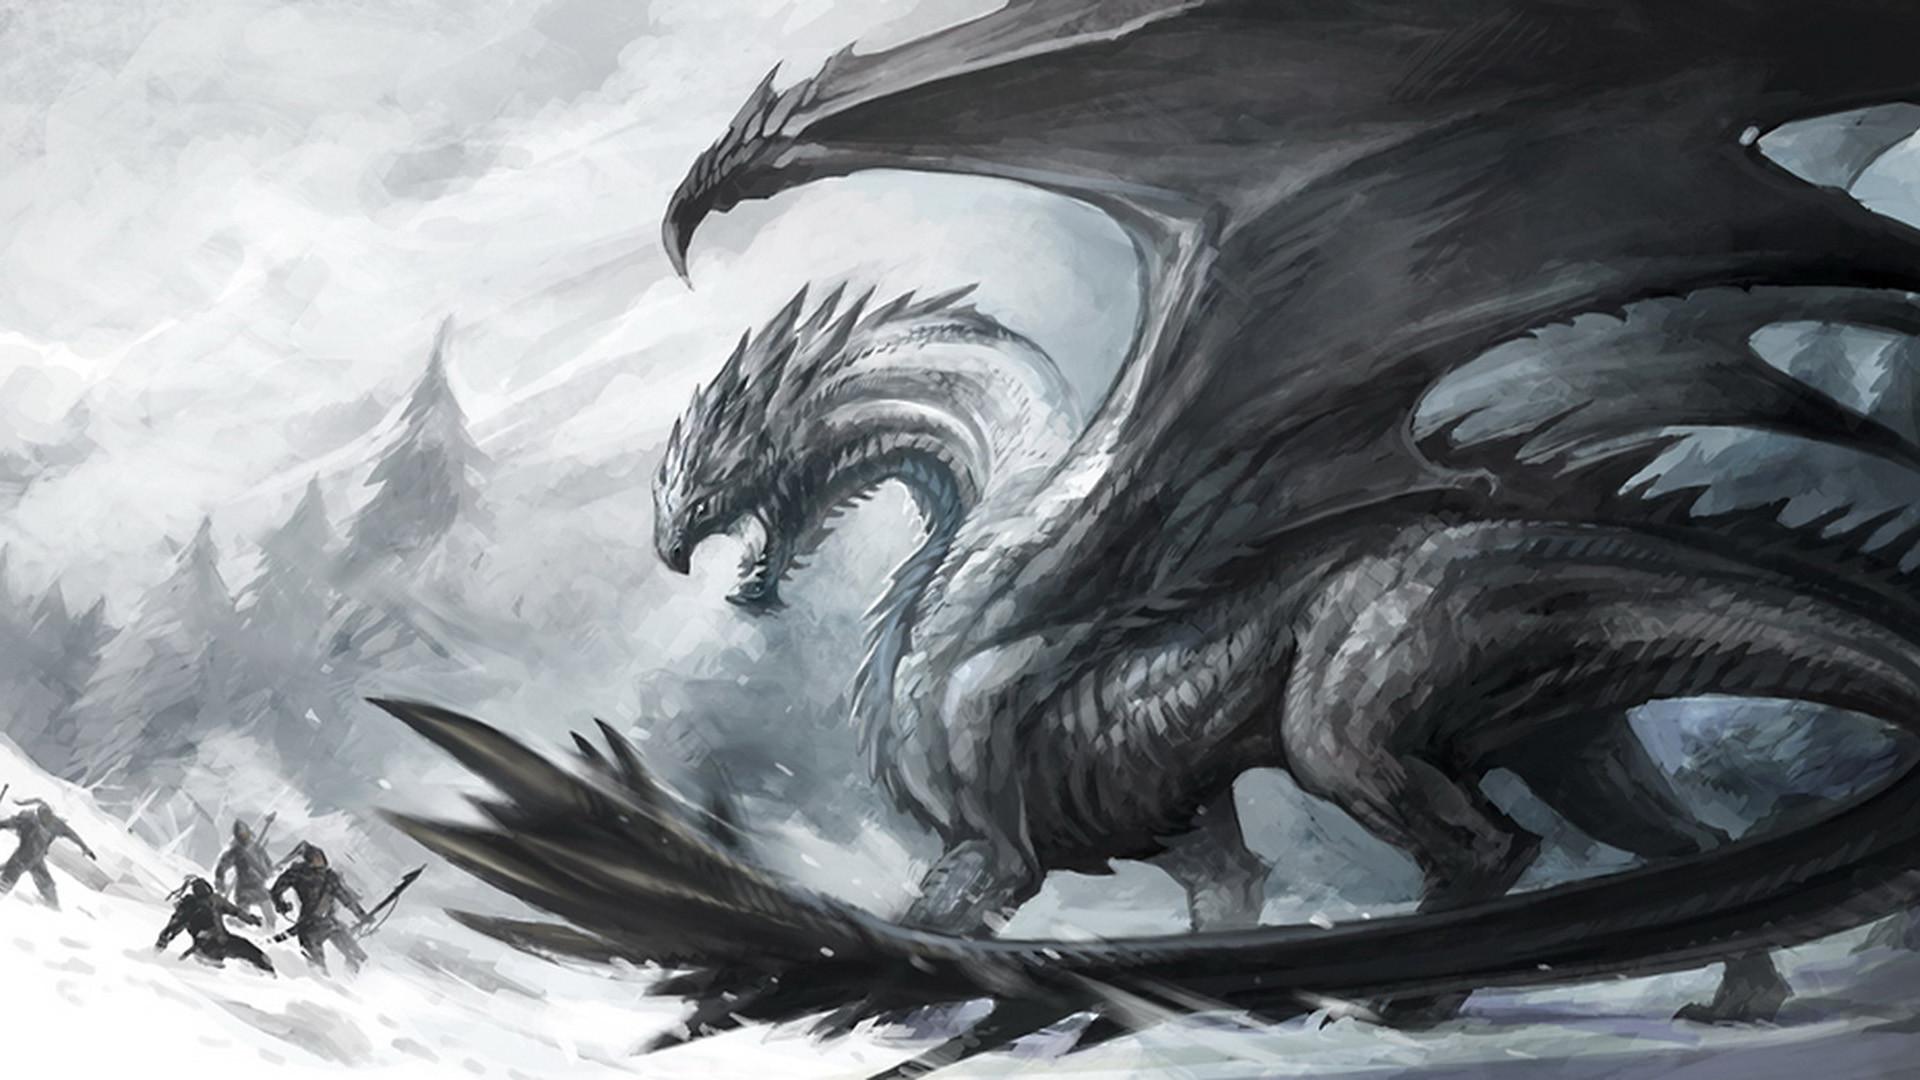 Fantasy Dragon Dark Creature Wallpaper